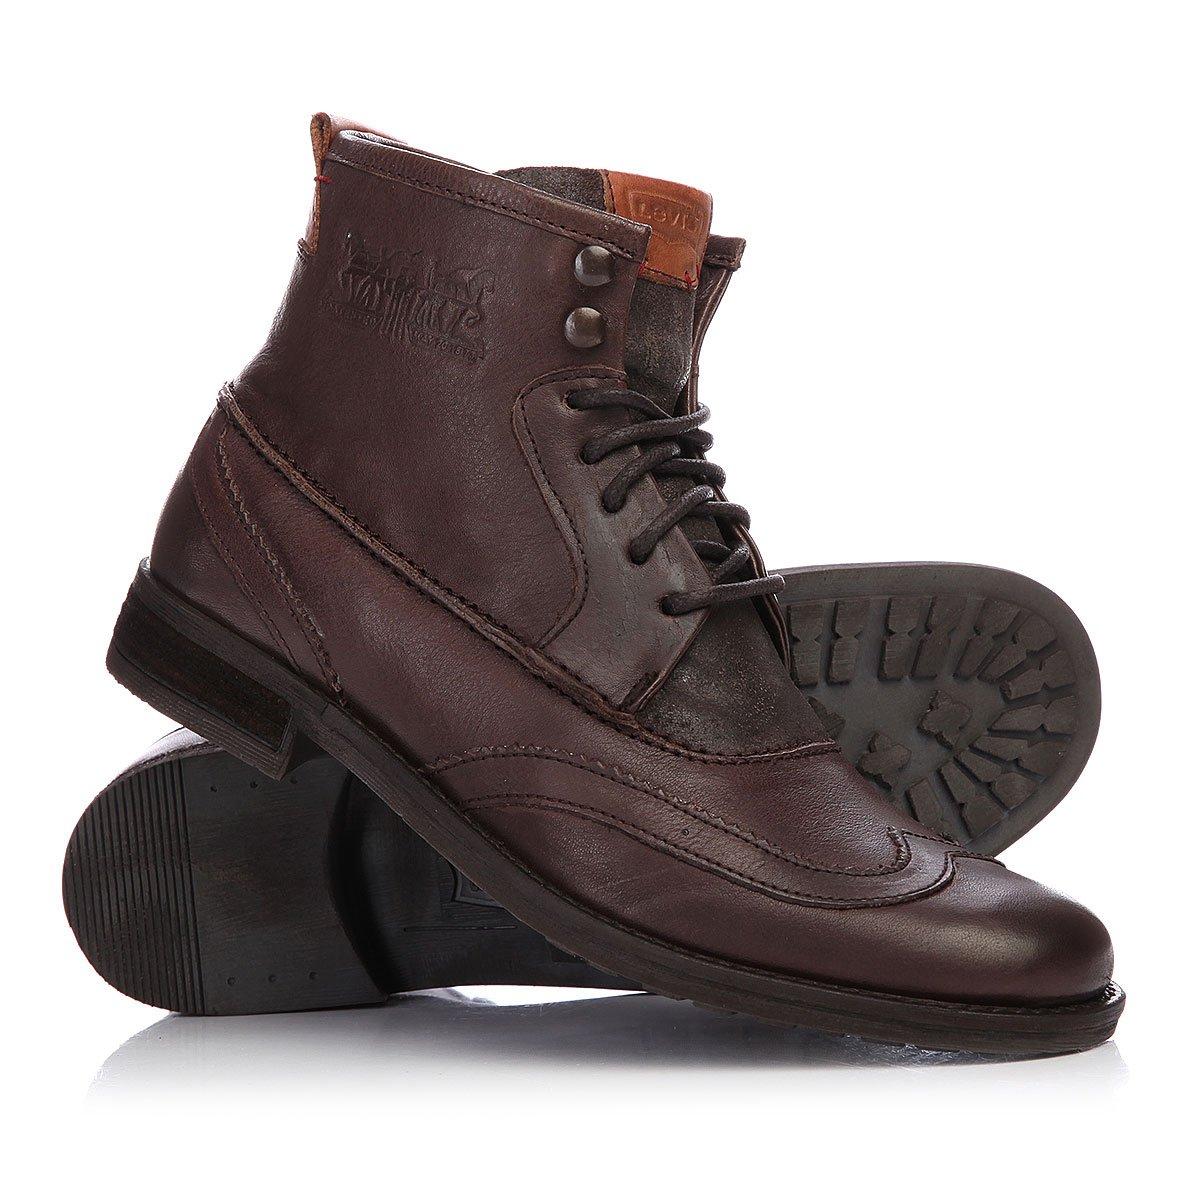 df03cd7b Купить ботинки Levis Maine Lace Up Wing Tip Dark Brown в интернет ...